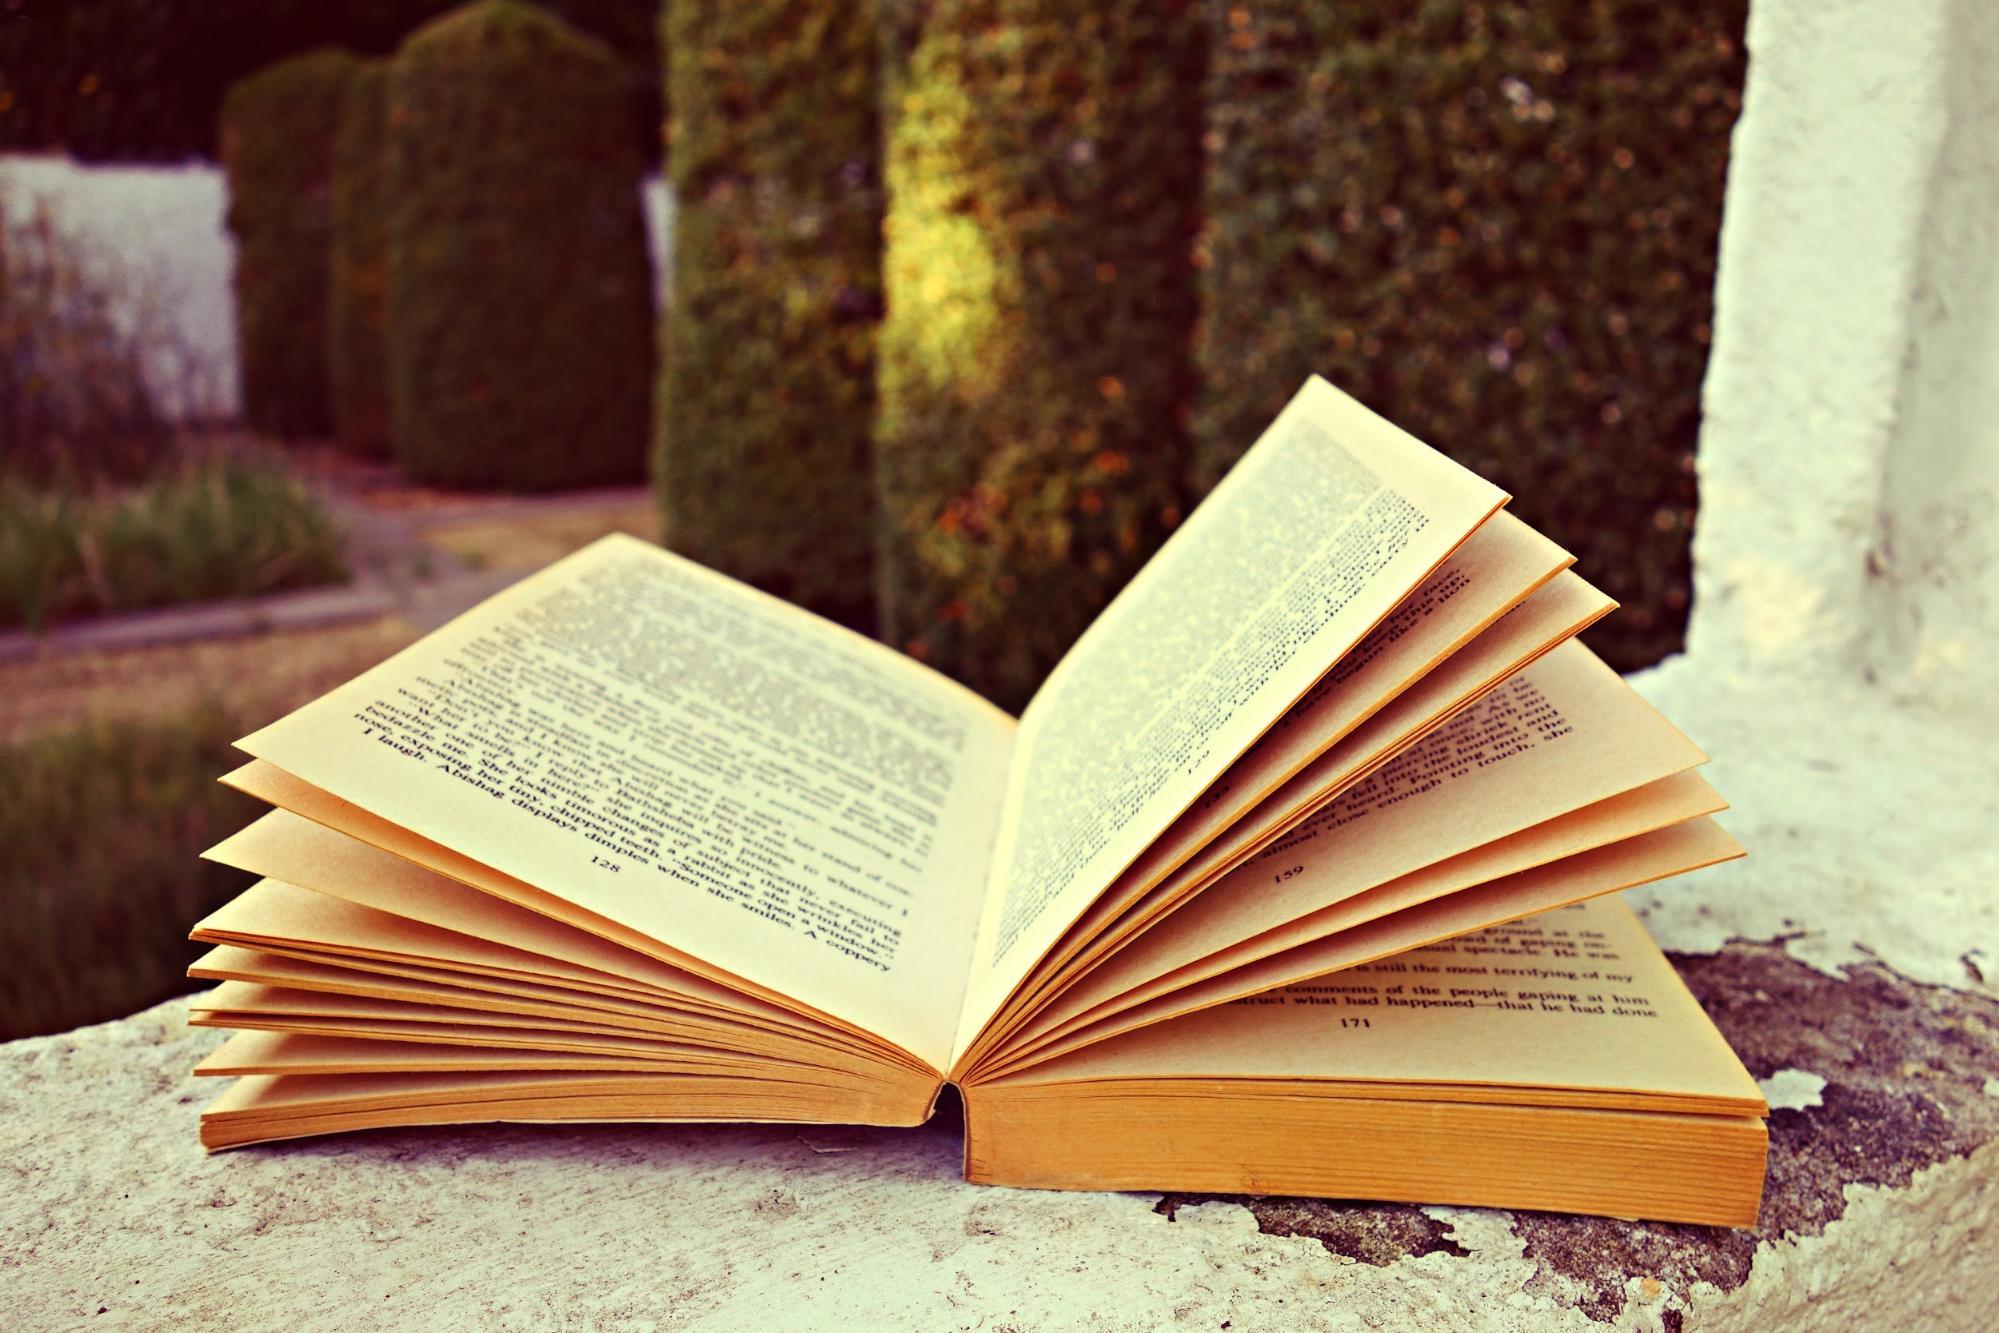 words, literature, open book